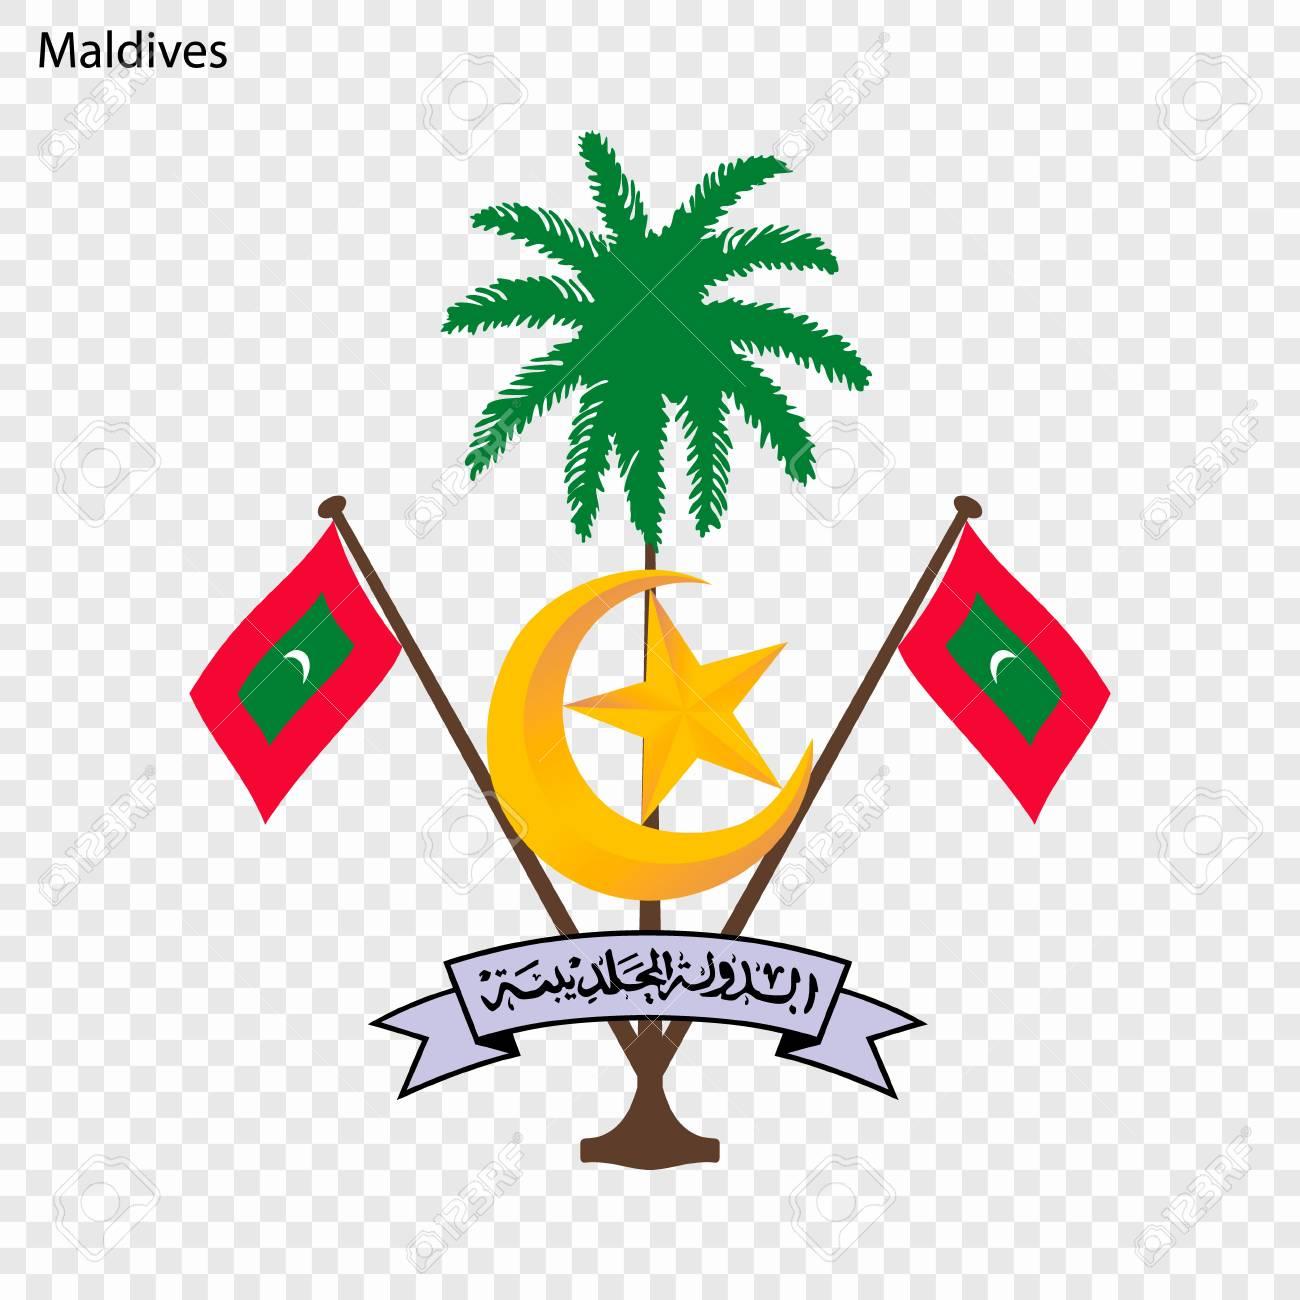 Symbol of Maldives  National emblem